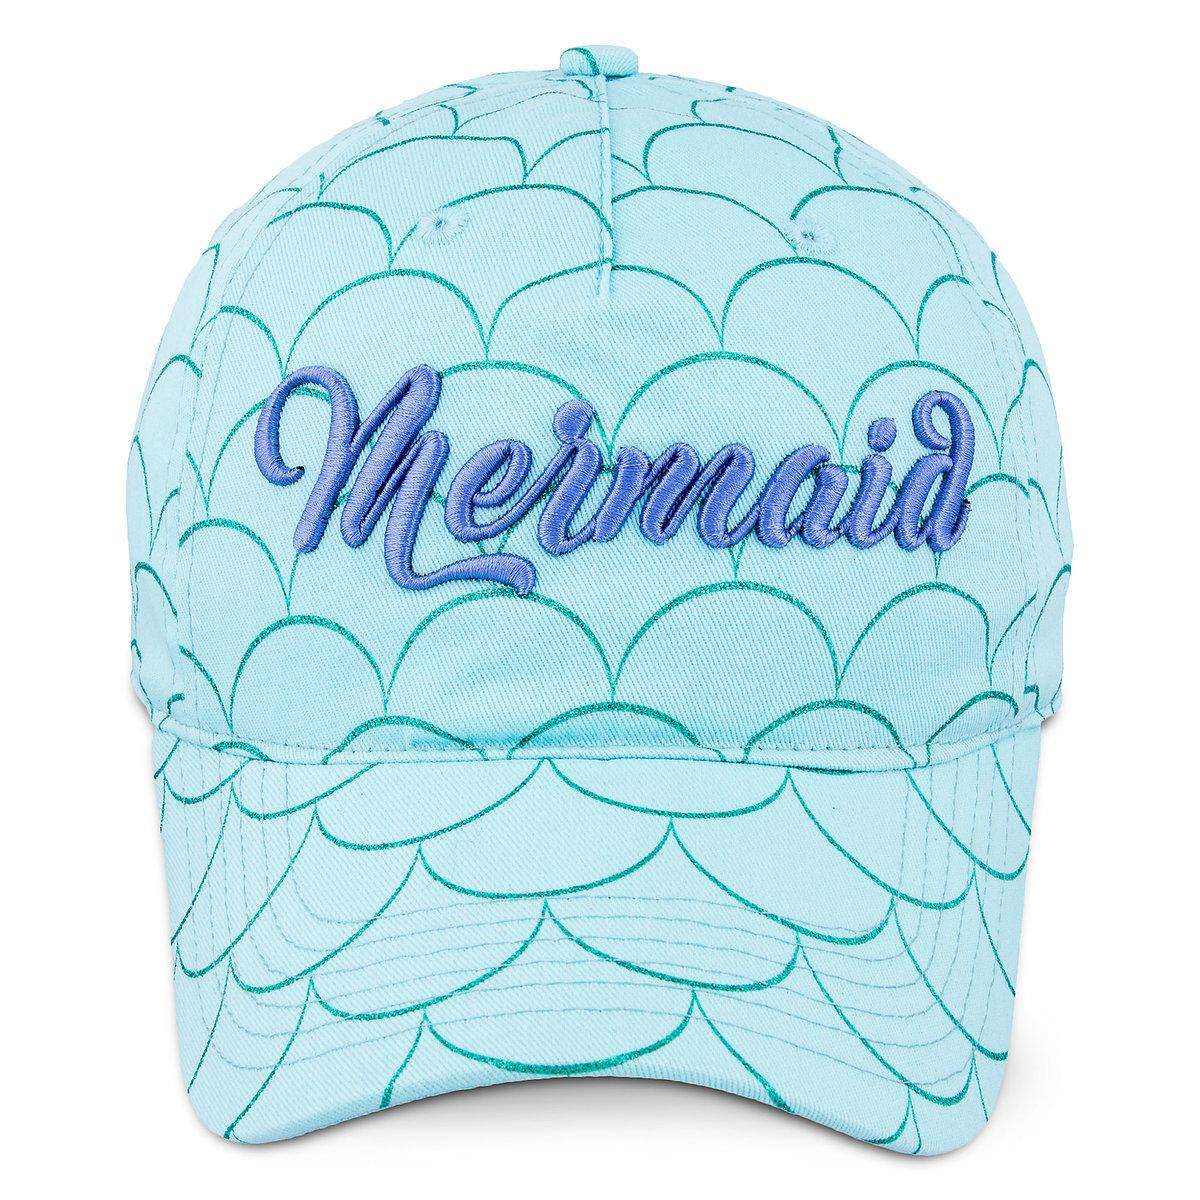 Add to My Lists. Disney Baseball Cap - The Little Mermaid cd0a11a800f